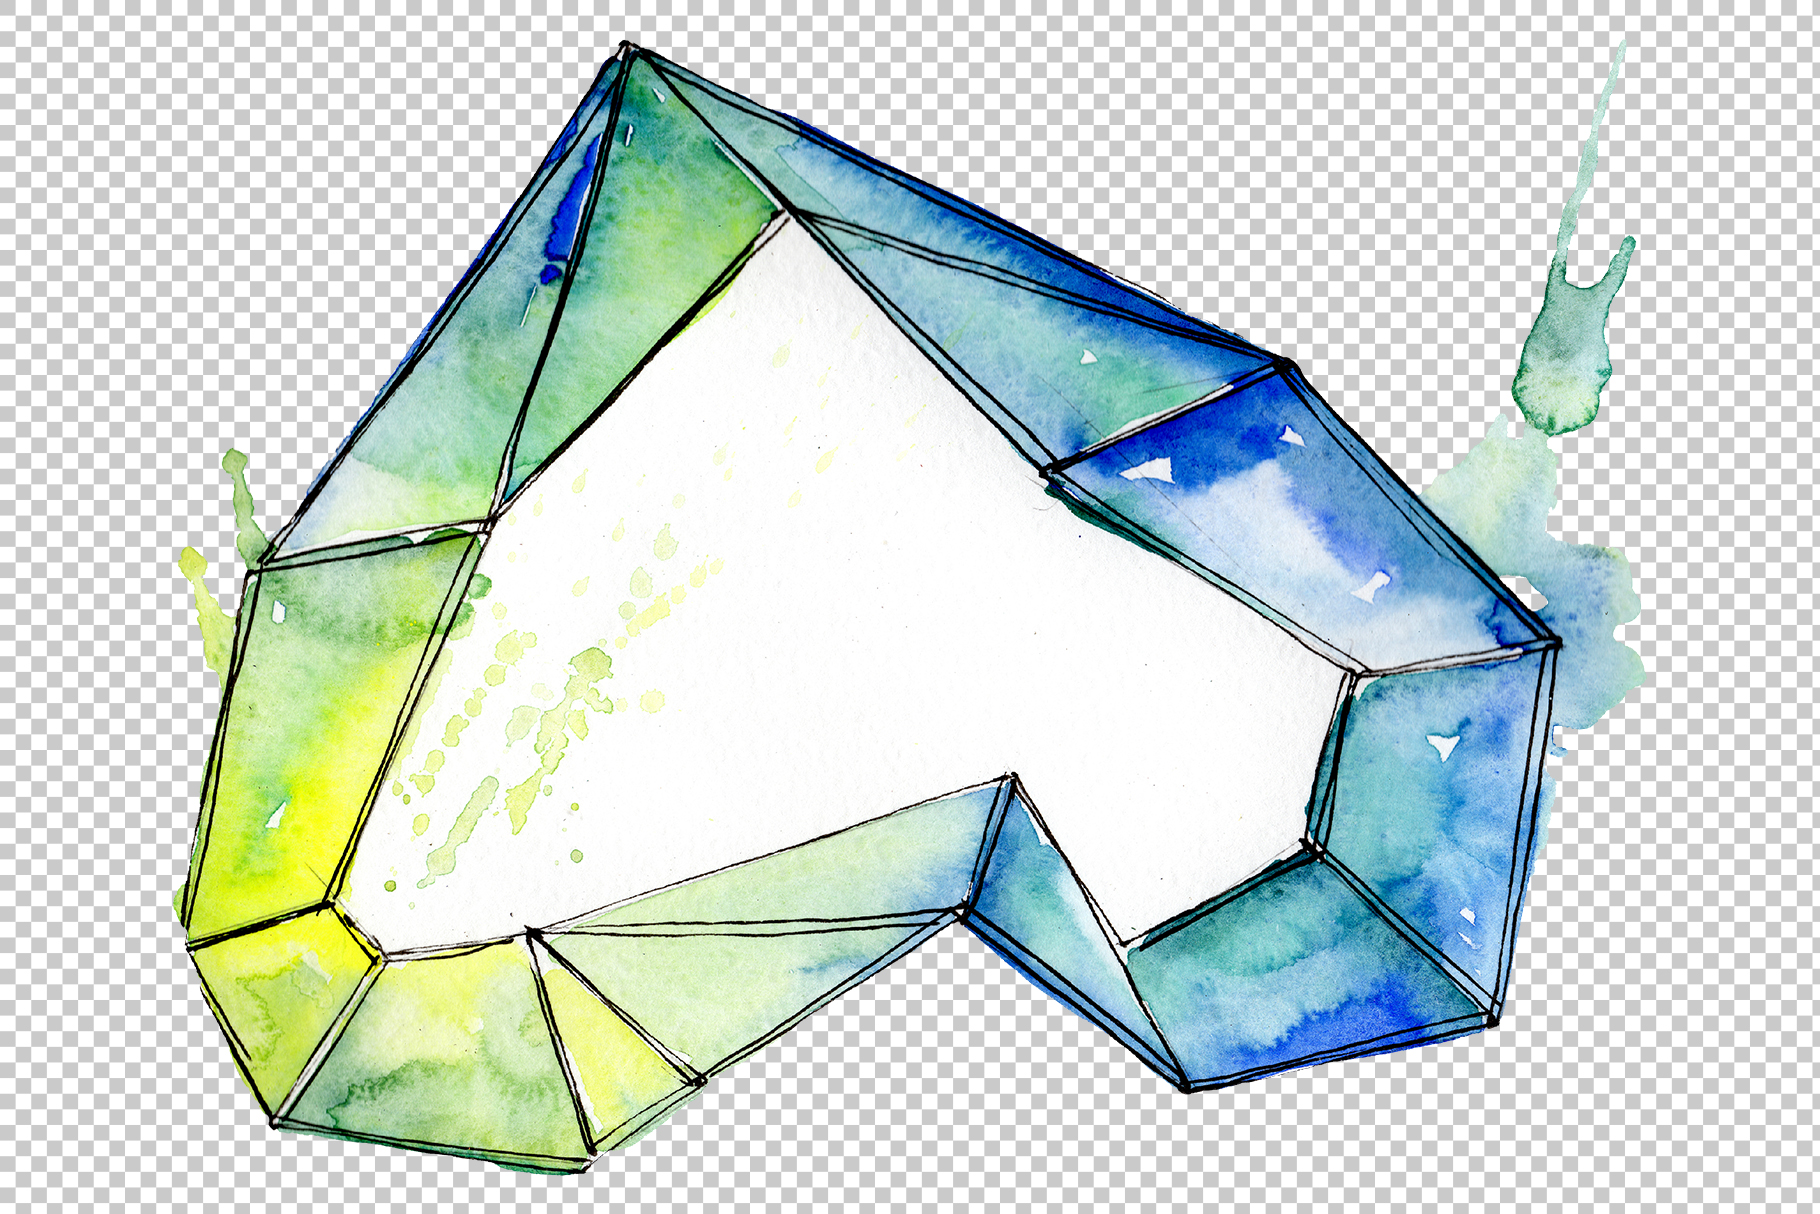 Aquamarine crystals Watercolor png example image 5